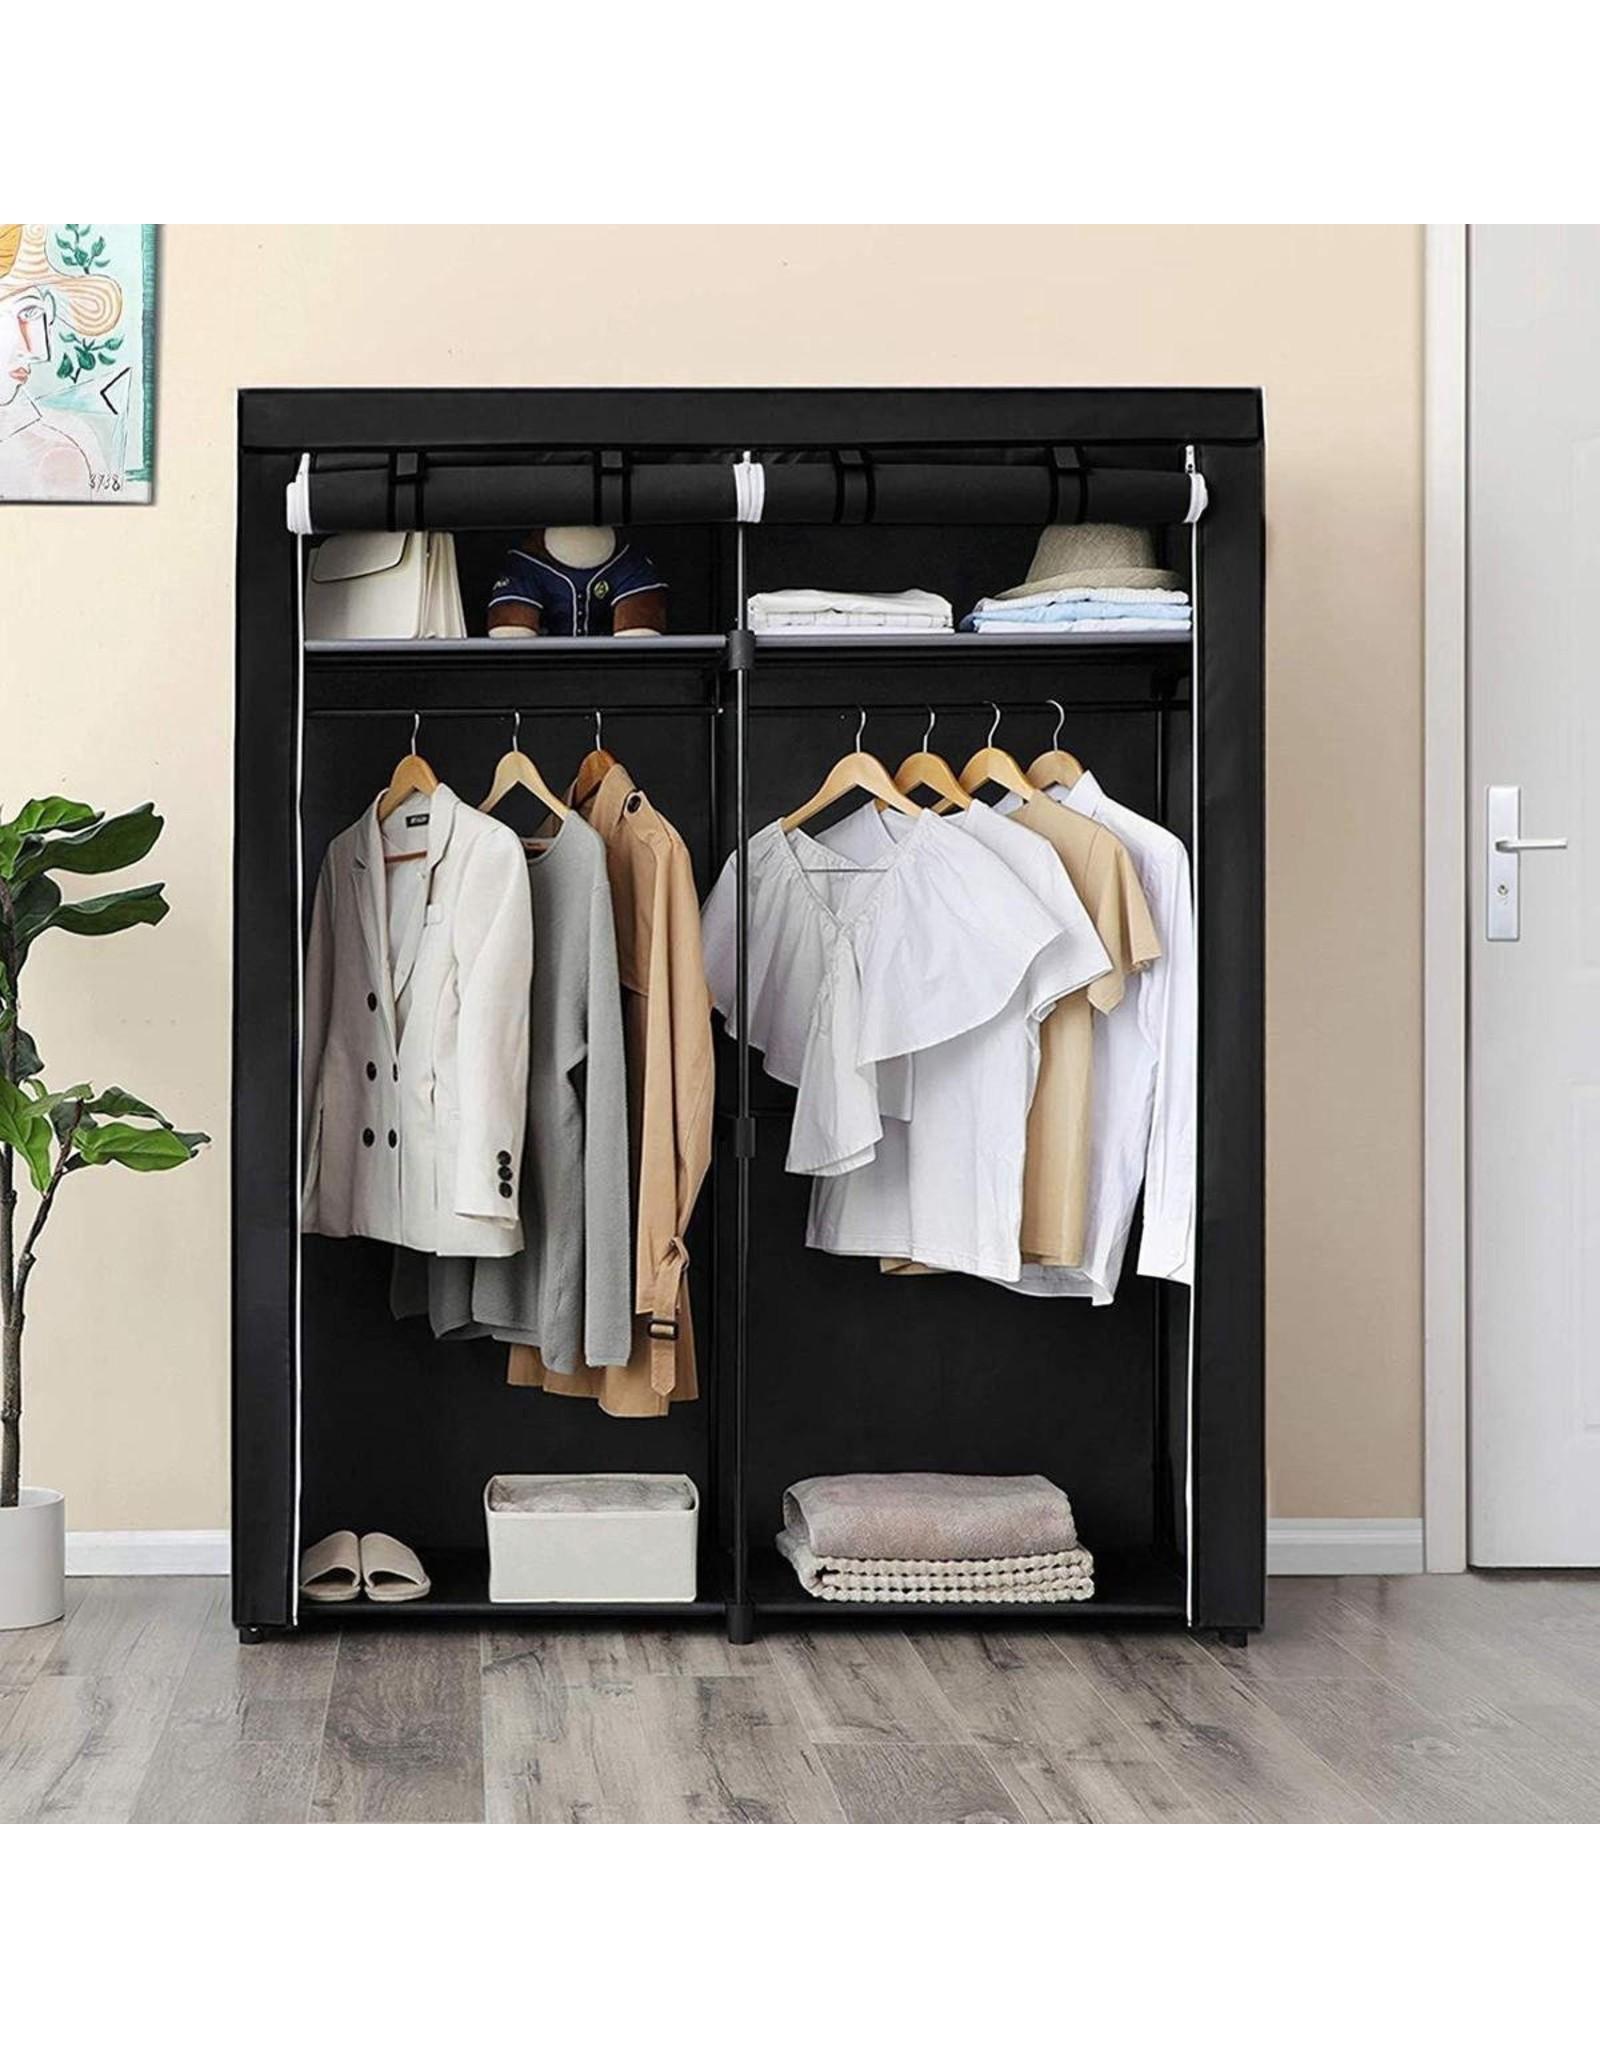 Parya Home Parya Home - Opvouwbare Garderobekast - Zwart